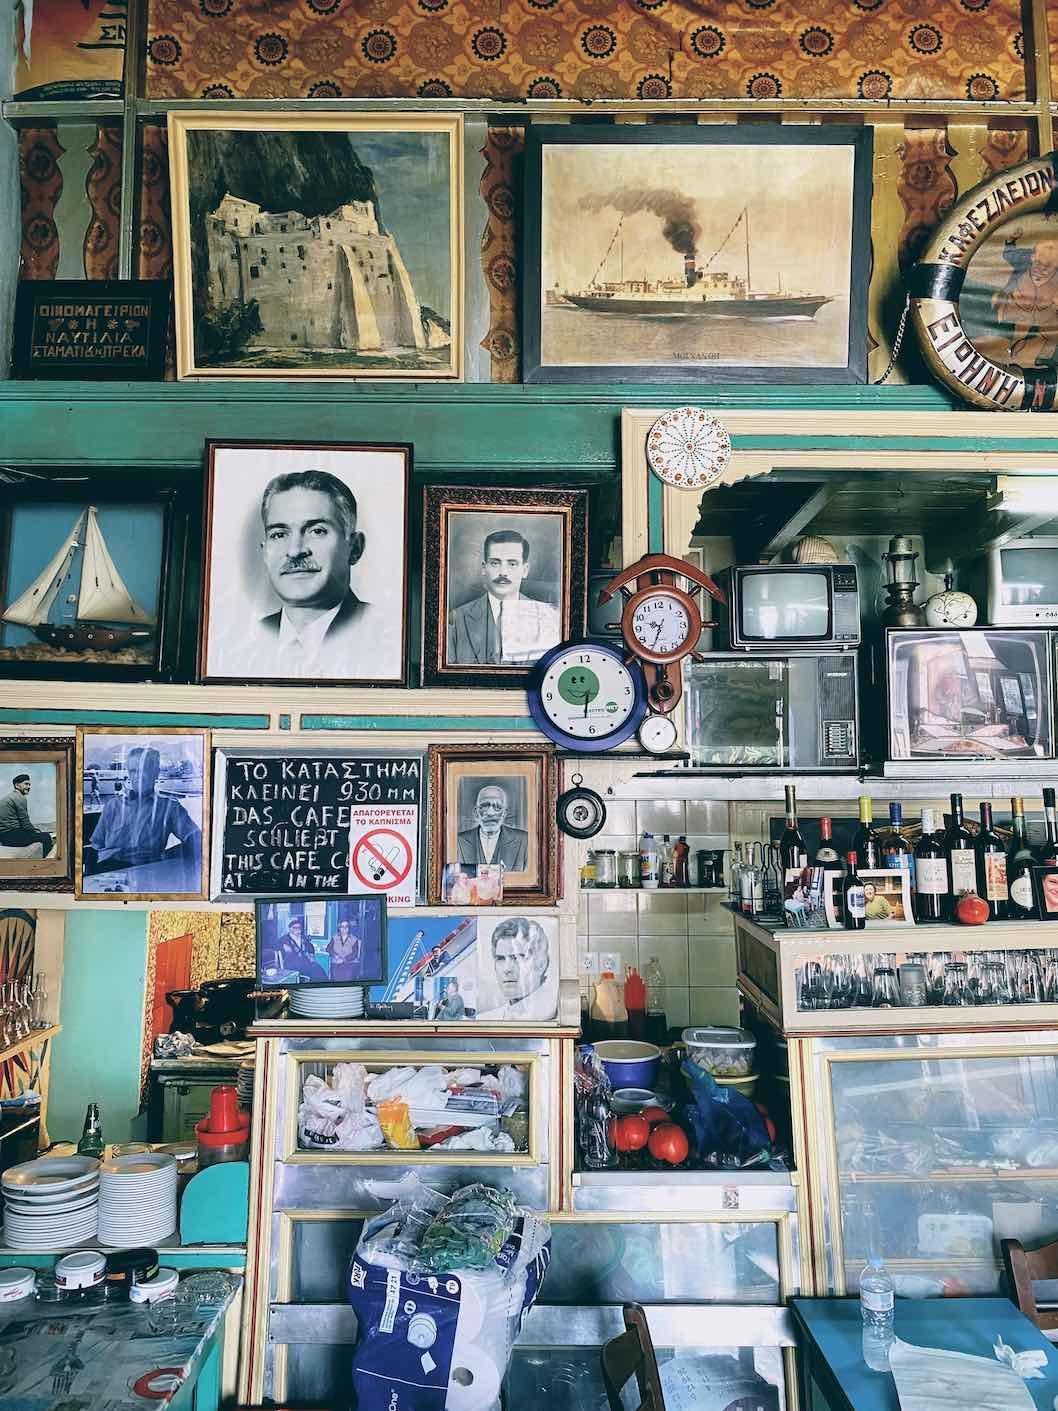 Travel Food People - Prekas, Amorgos